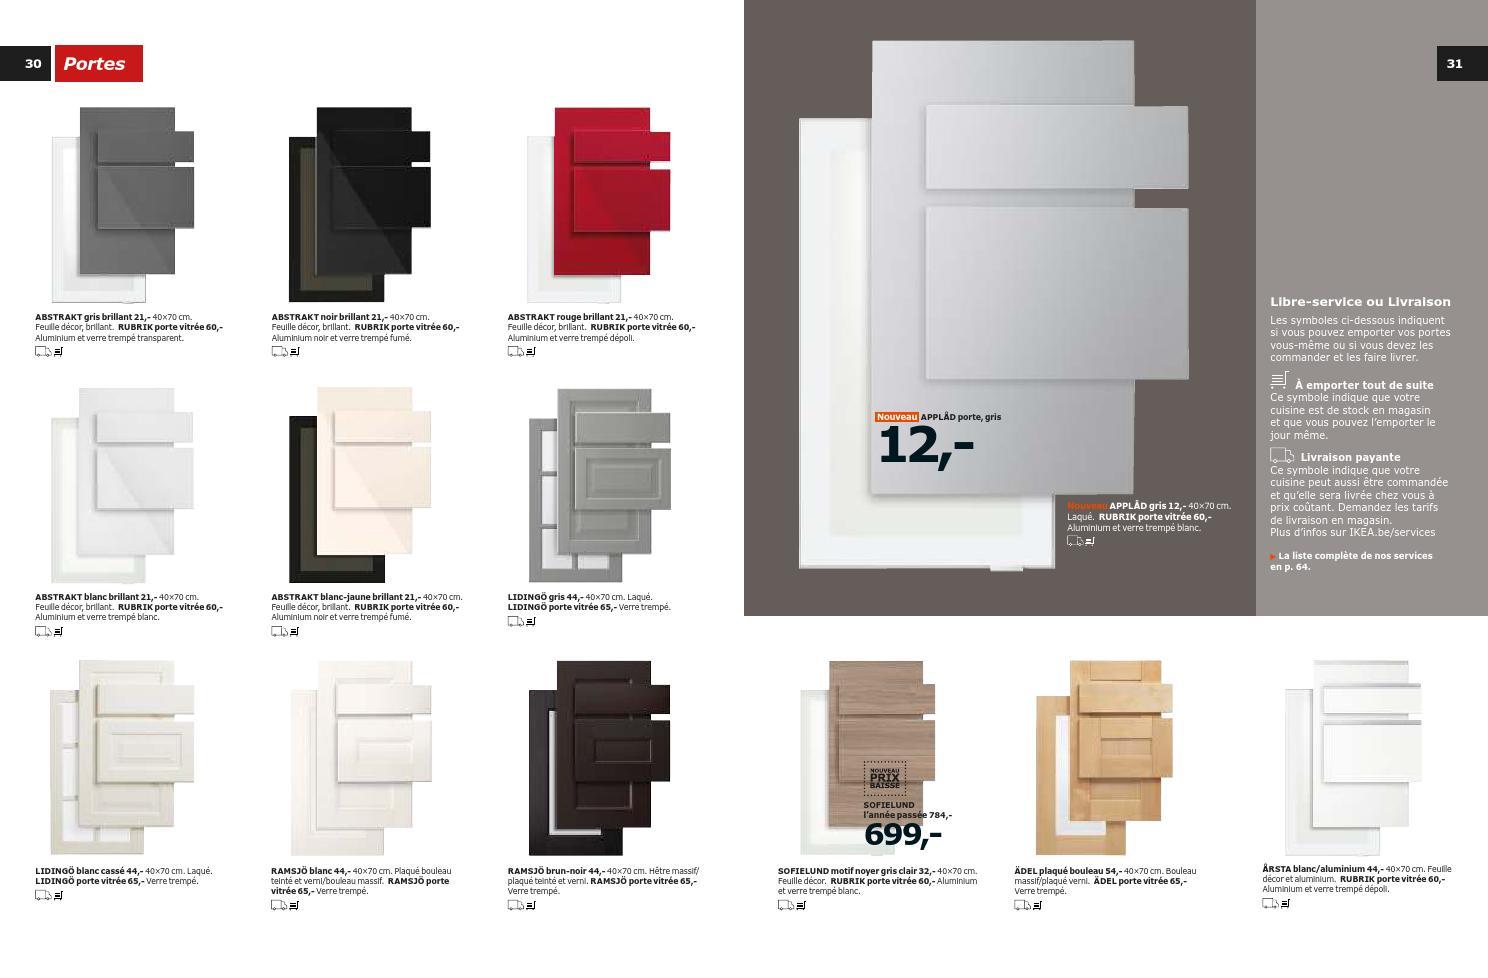 Porte Laque Blanc Ikea catalogue ikea cuisine 2014 fr completeadclick bvba - issuu